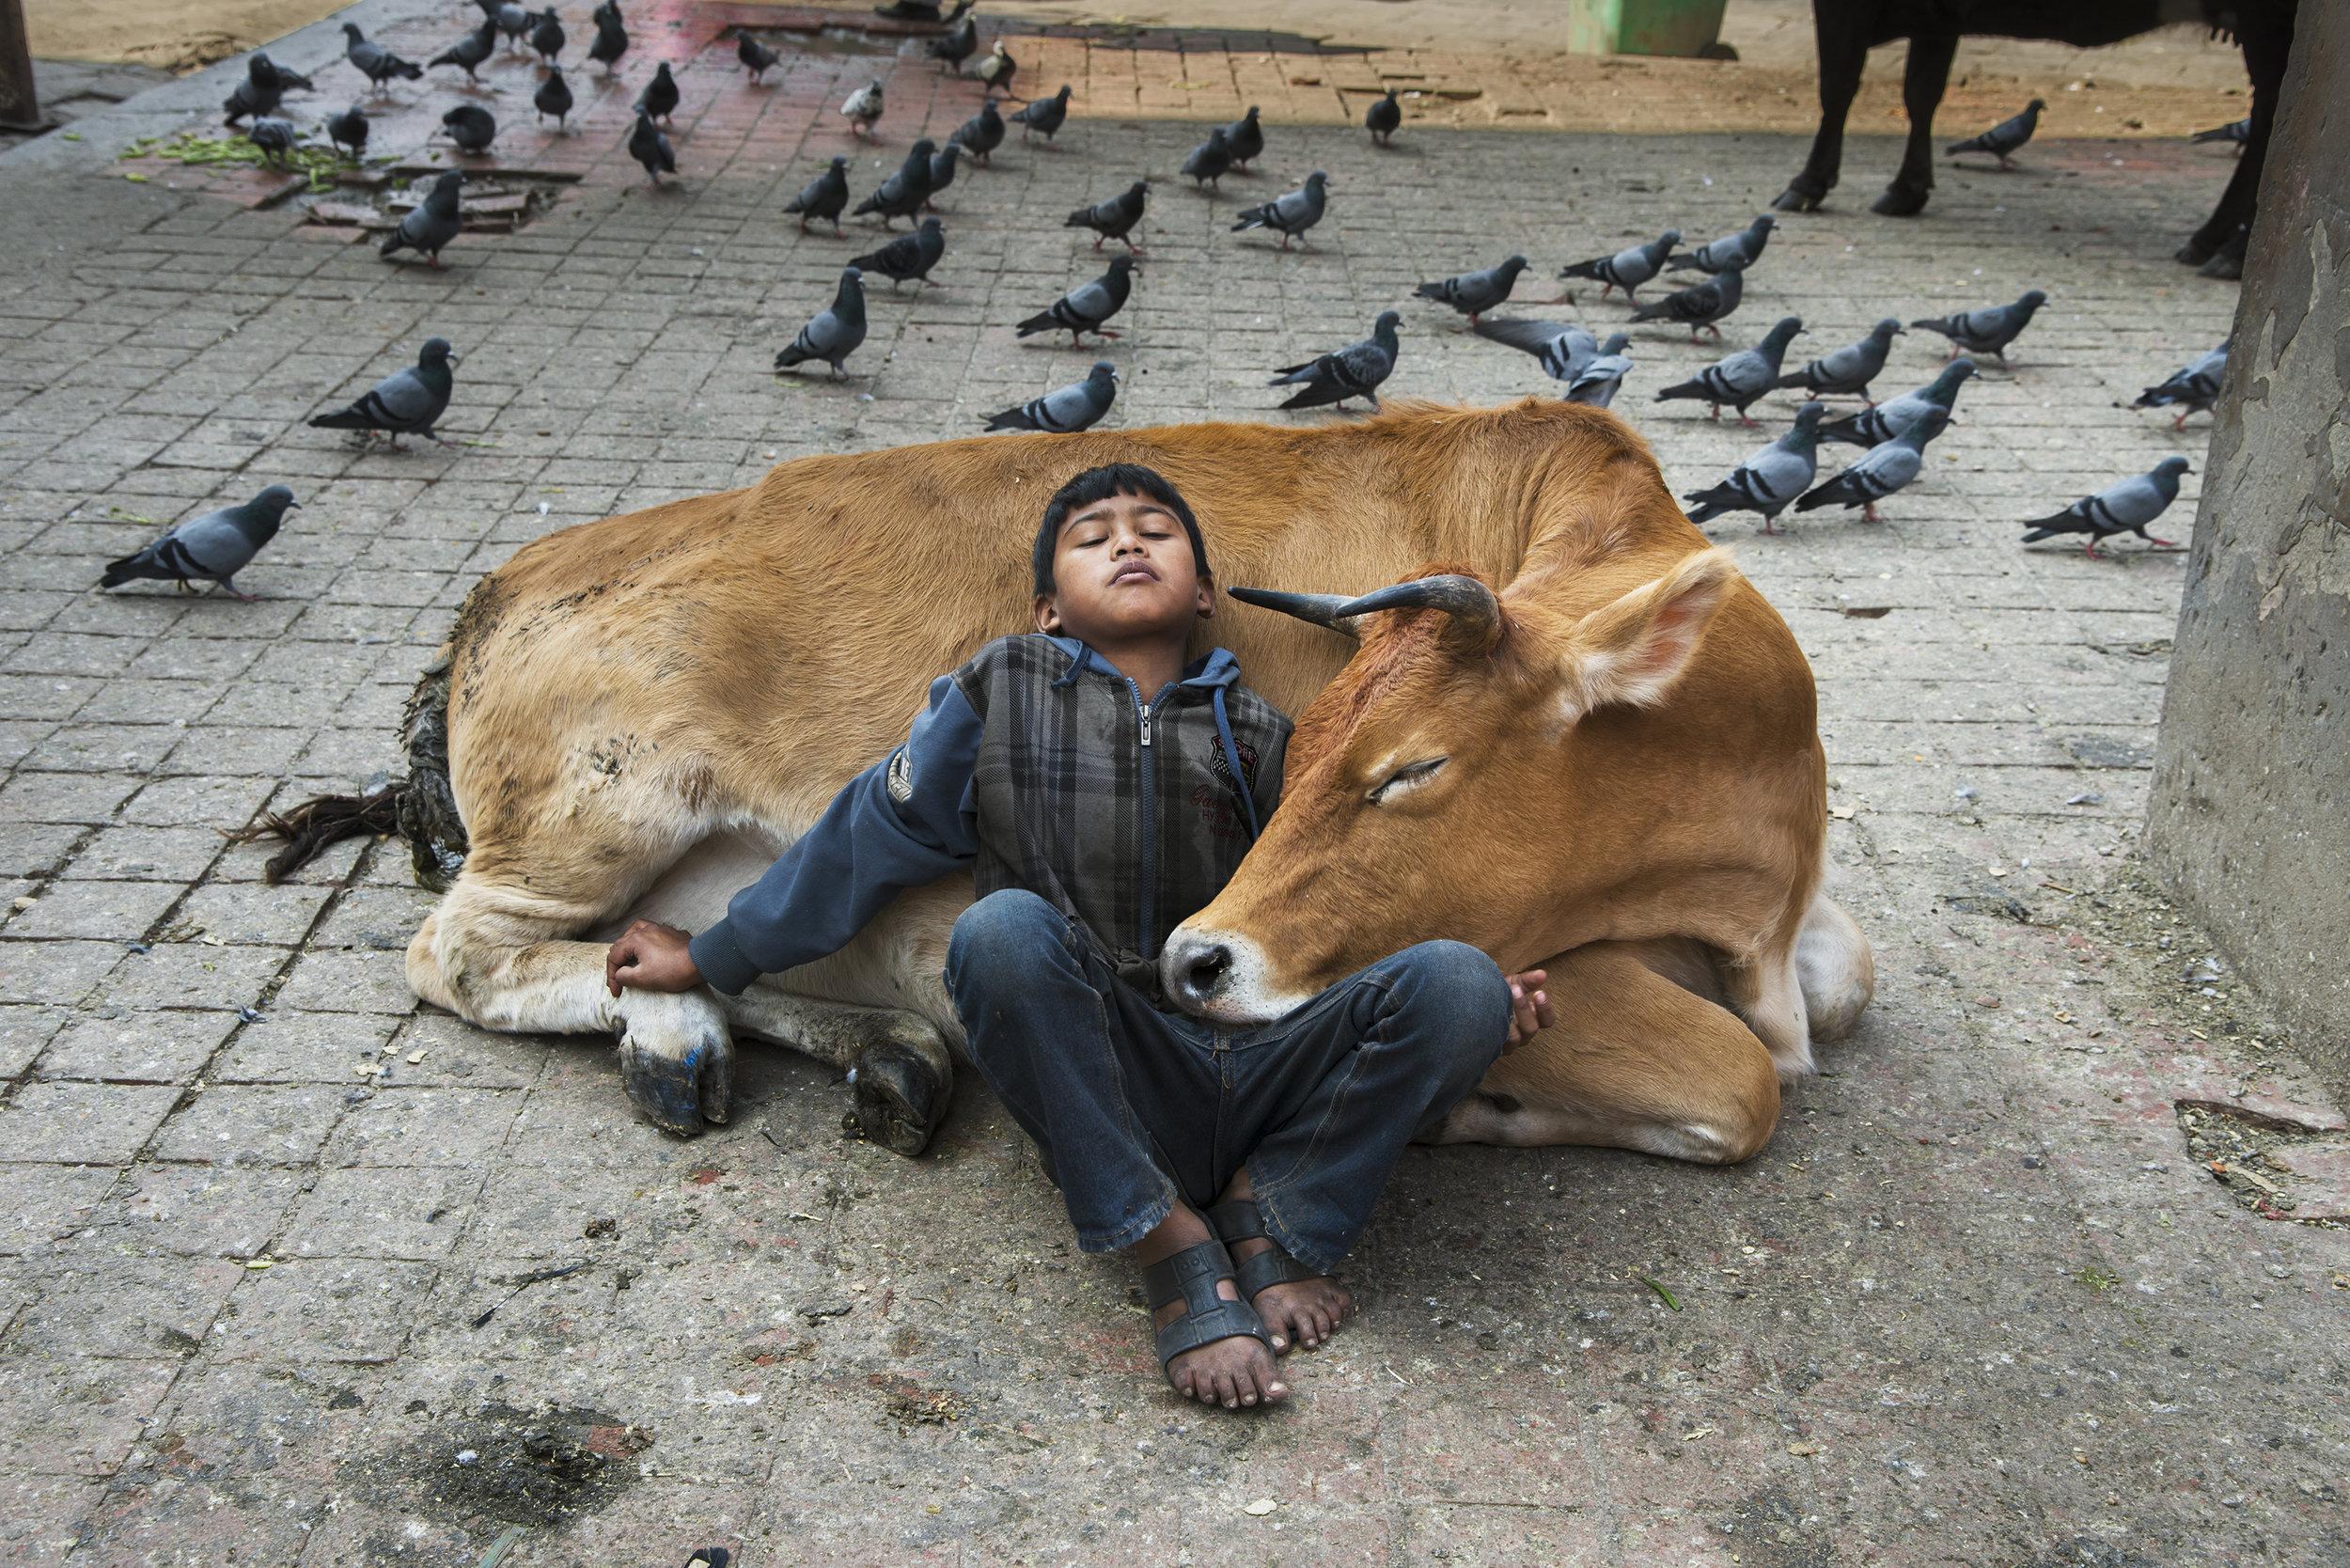 Steve McCurry, Kathmandu, Nepal, 2013 - - Copyright Steve McCurry ©